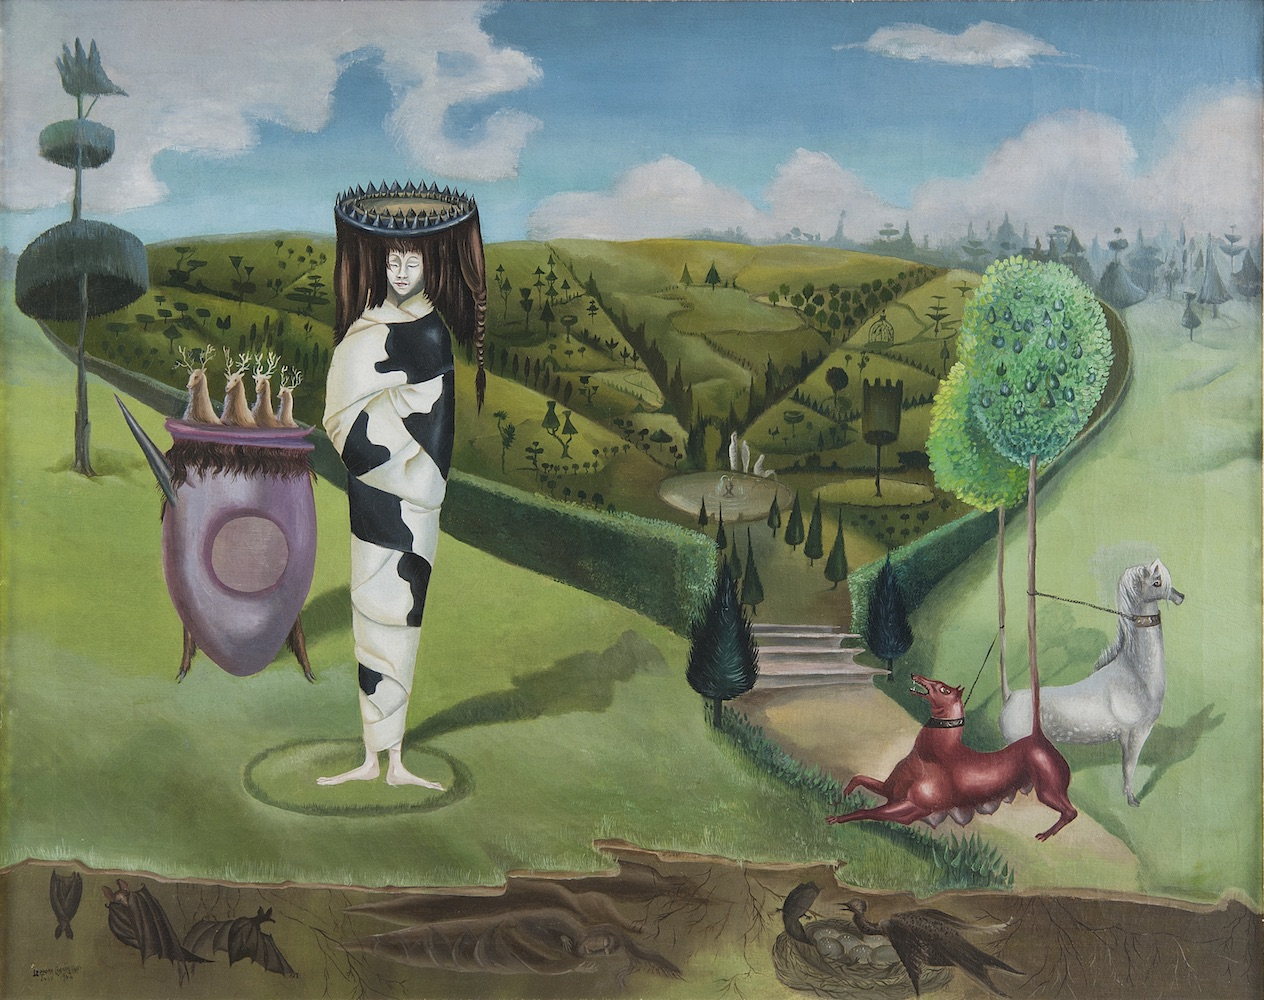 Leonora Carrington,  Green Tea , 1942, Oil on canvas, 24 x 30 inches (61 x 76.2 cm), © 2019 Estate of Leonora Carrington / Artists Rights Society (ARS), New York